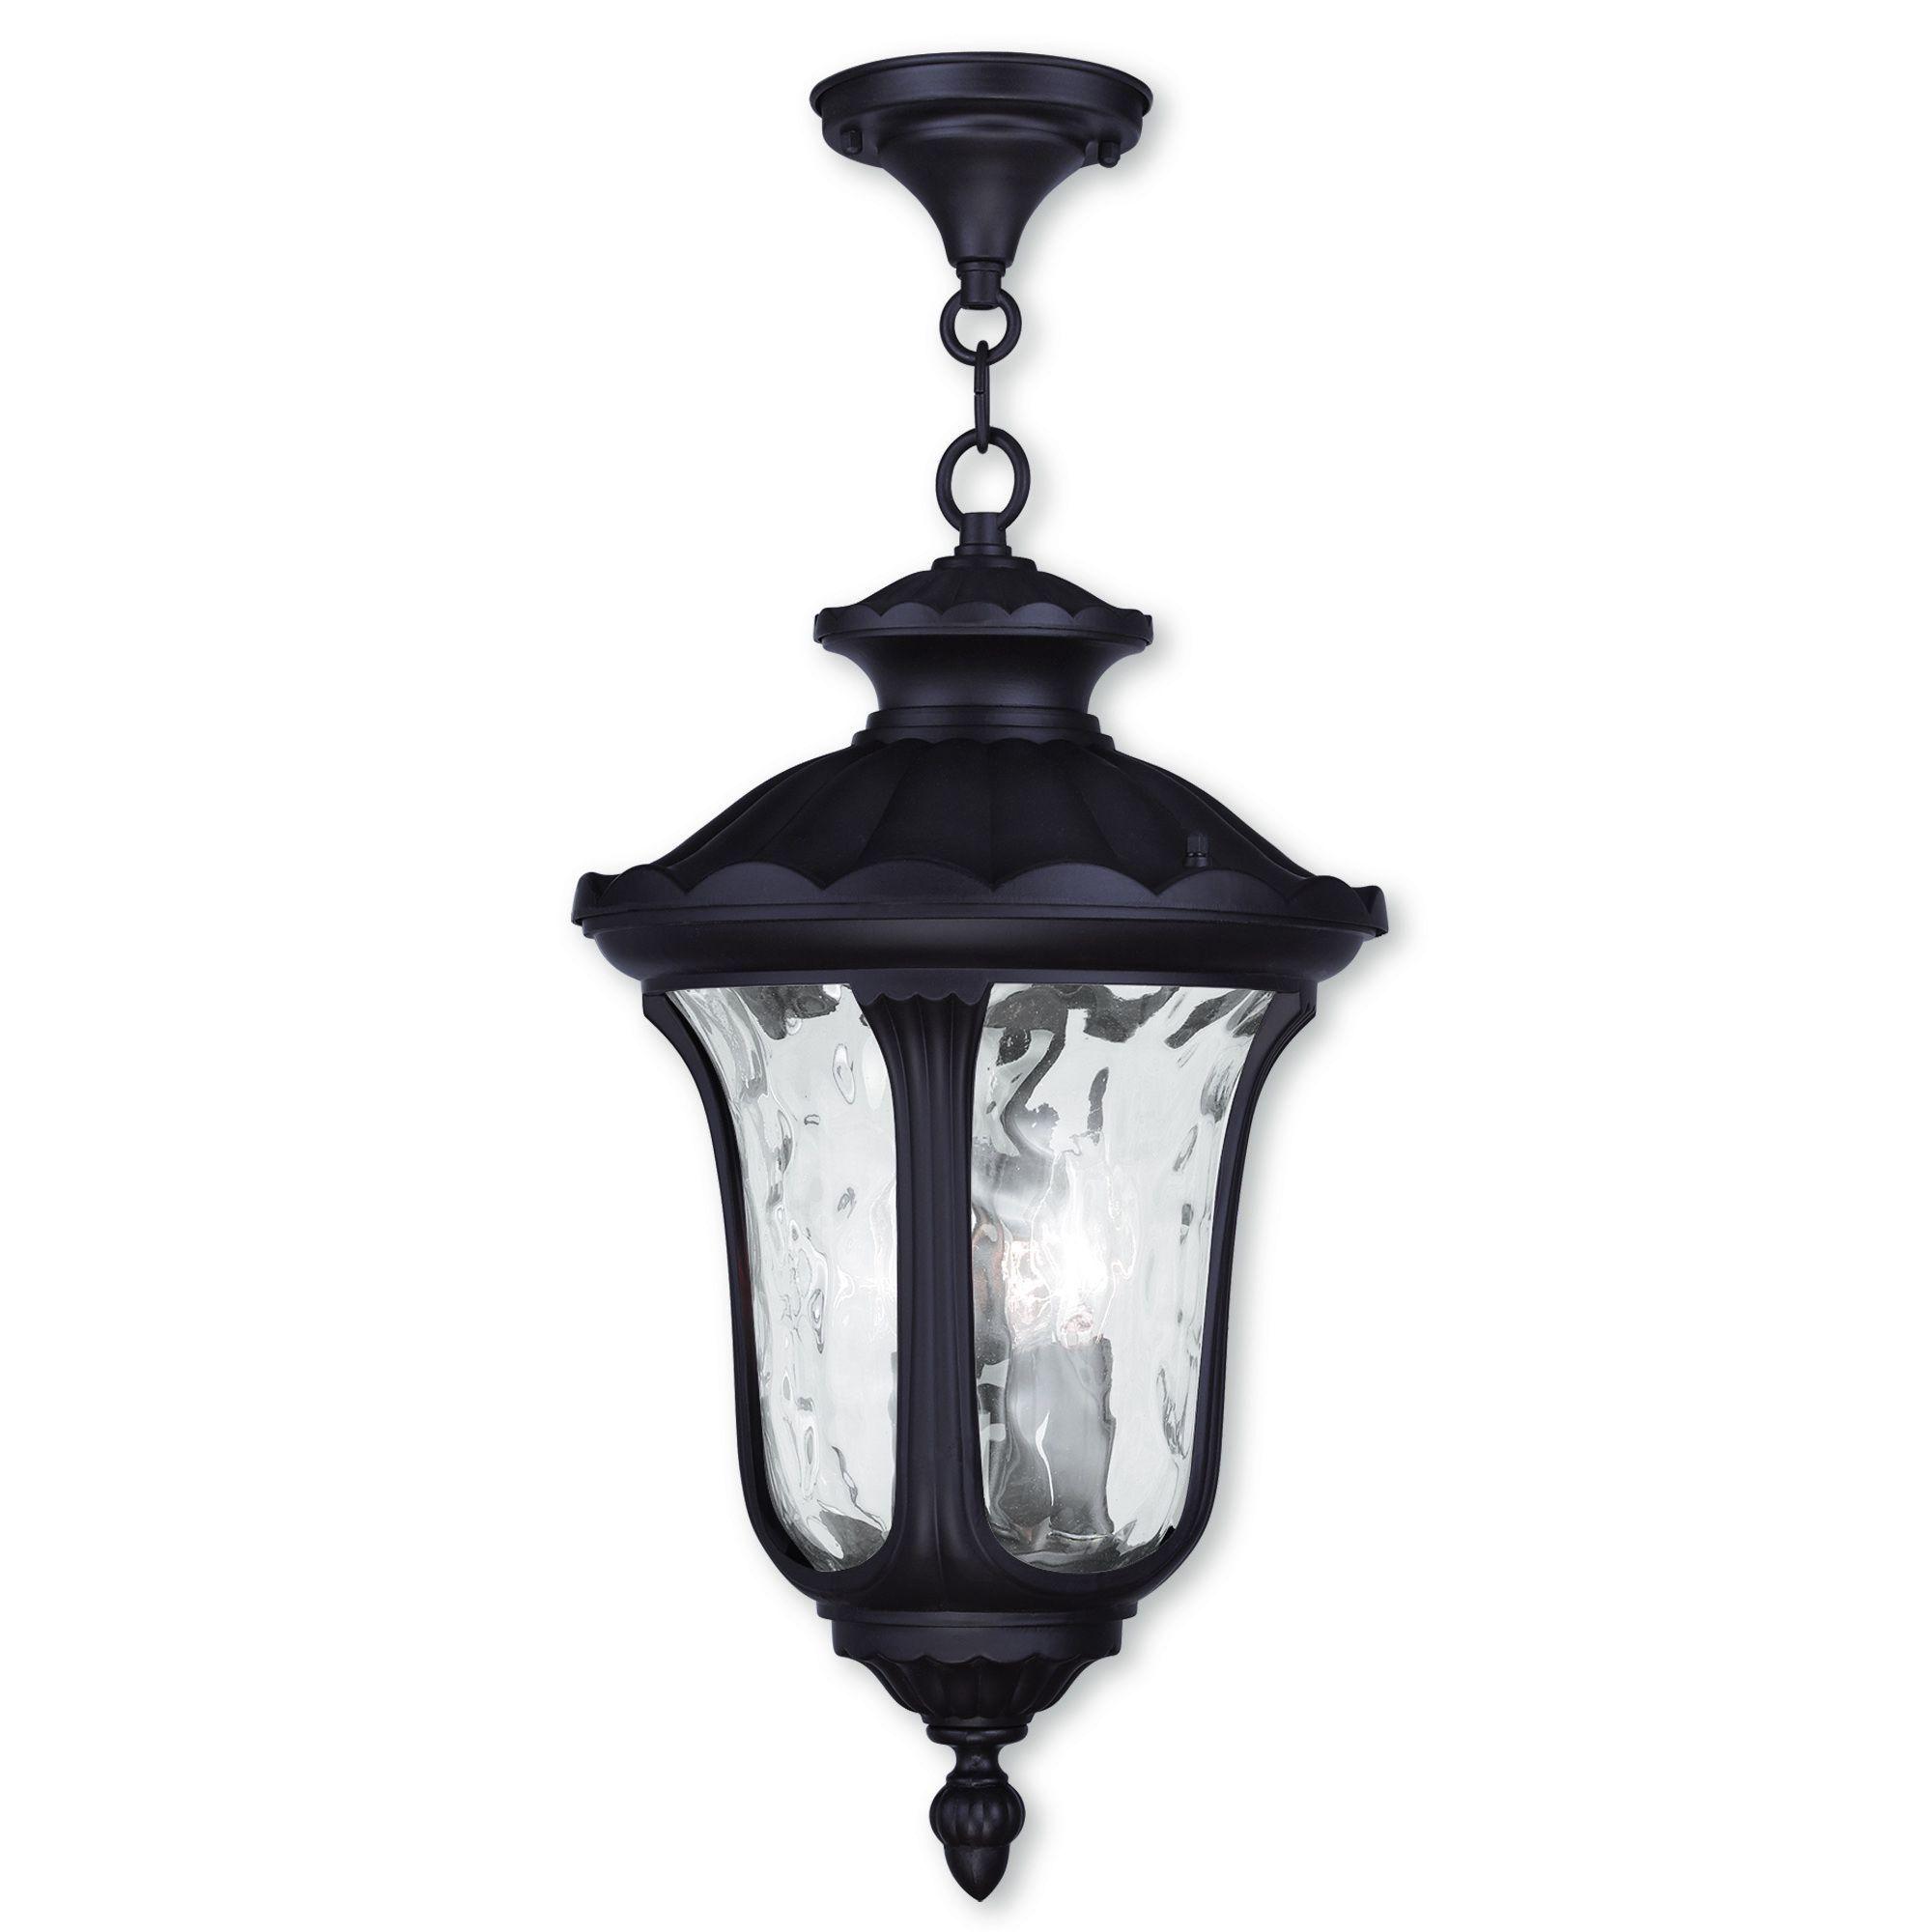 Livex Lighting Oxford Bronze-finish Aluminum 3-light Outdoor Chain Lantern (Bronze), Brown